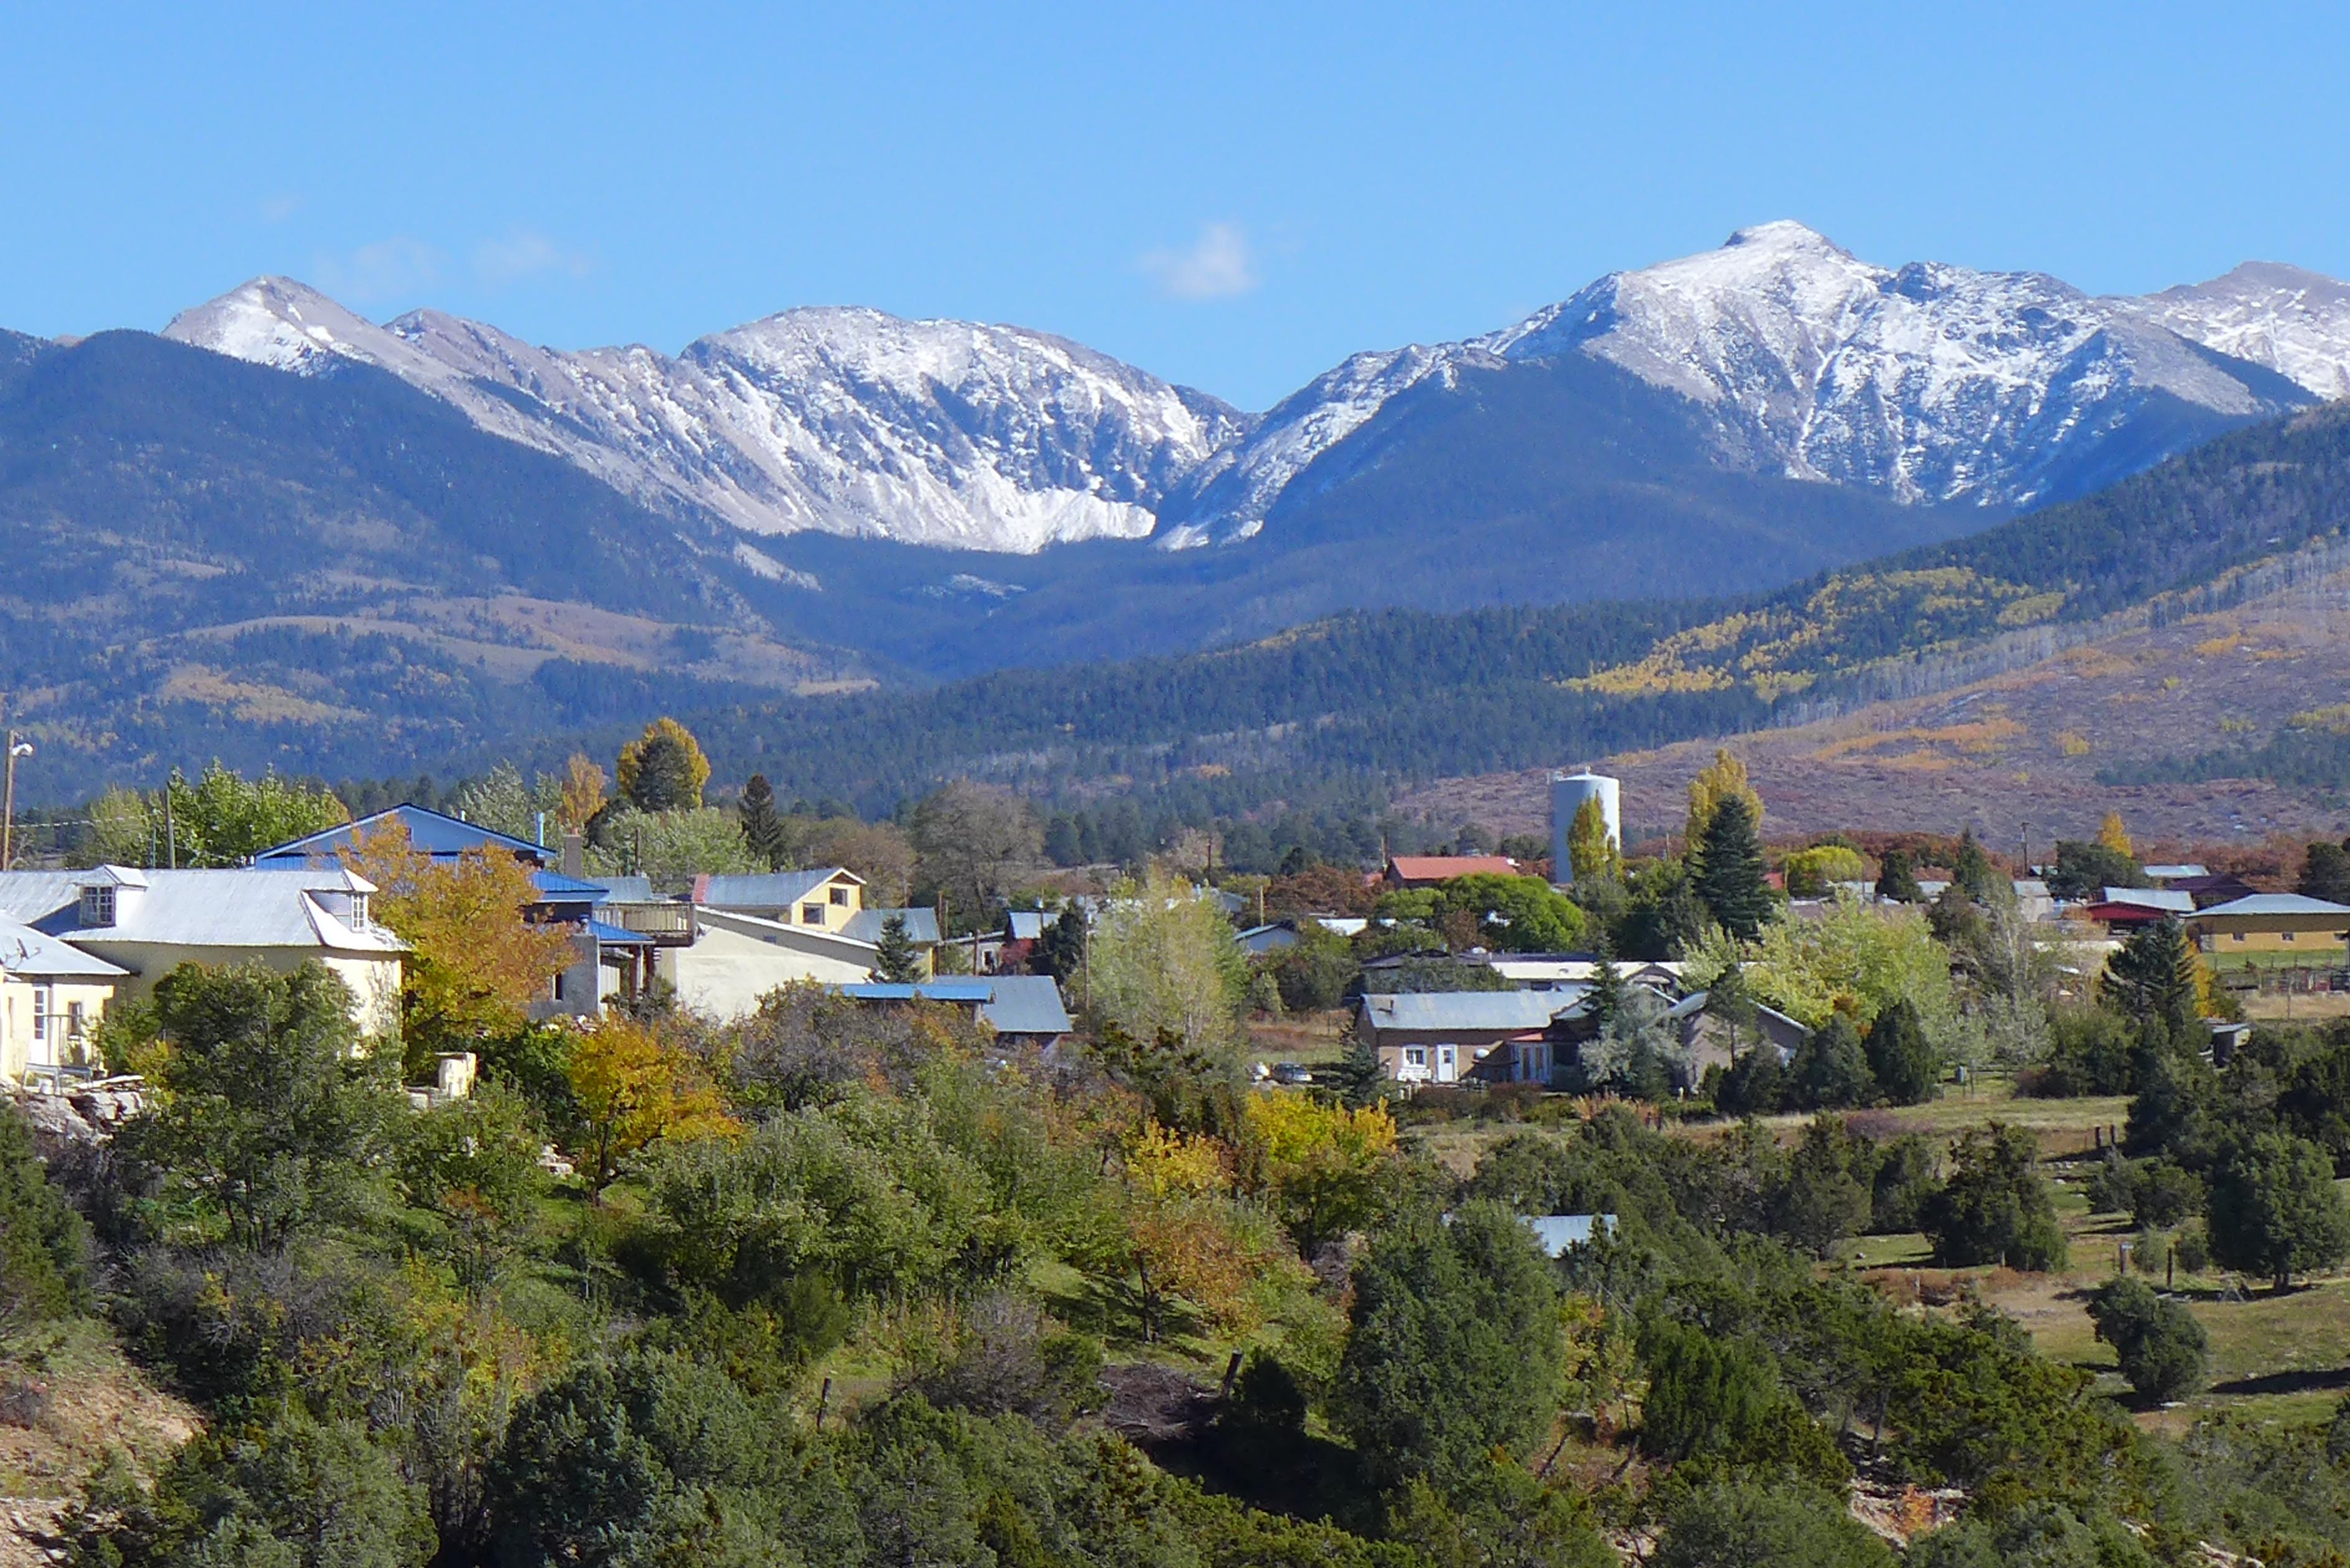 Albuquerque To Santa Fe >> New Mexico, October 19-23, 2013 | urban bicycle journeys